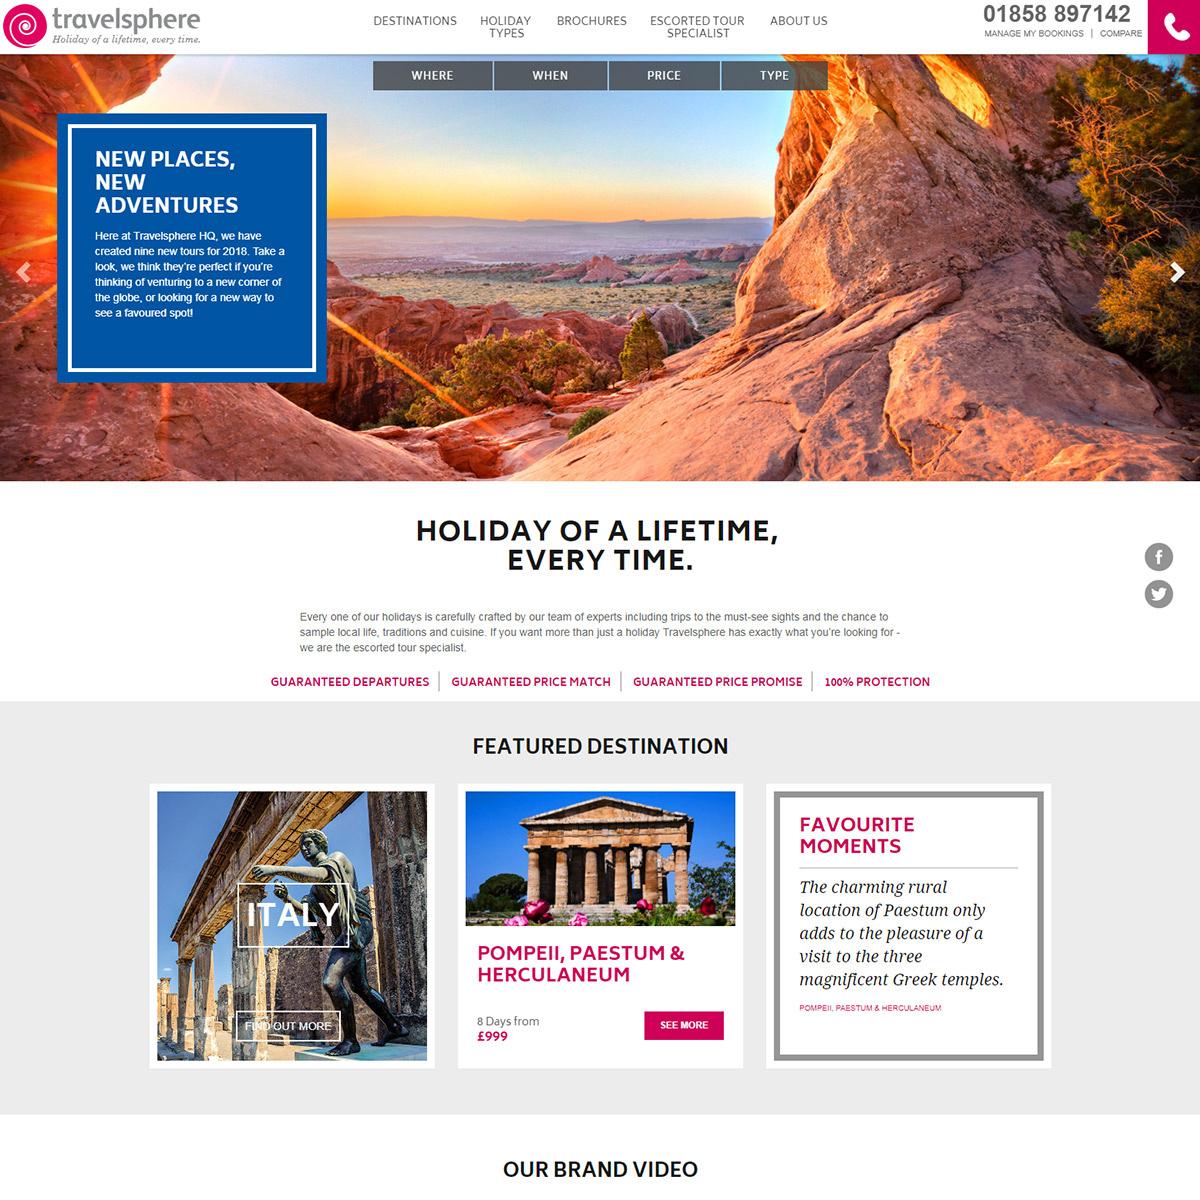 Travelsphere website re-brand